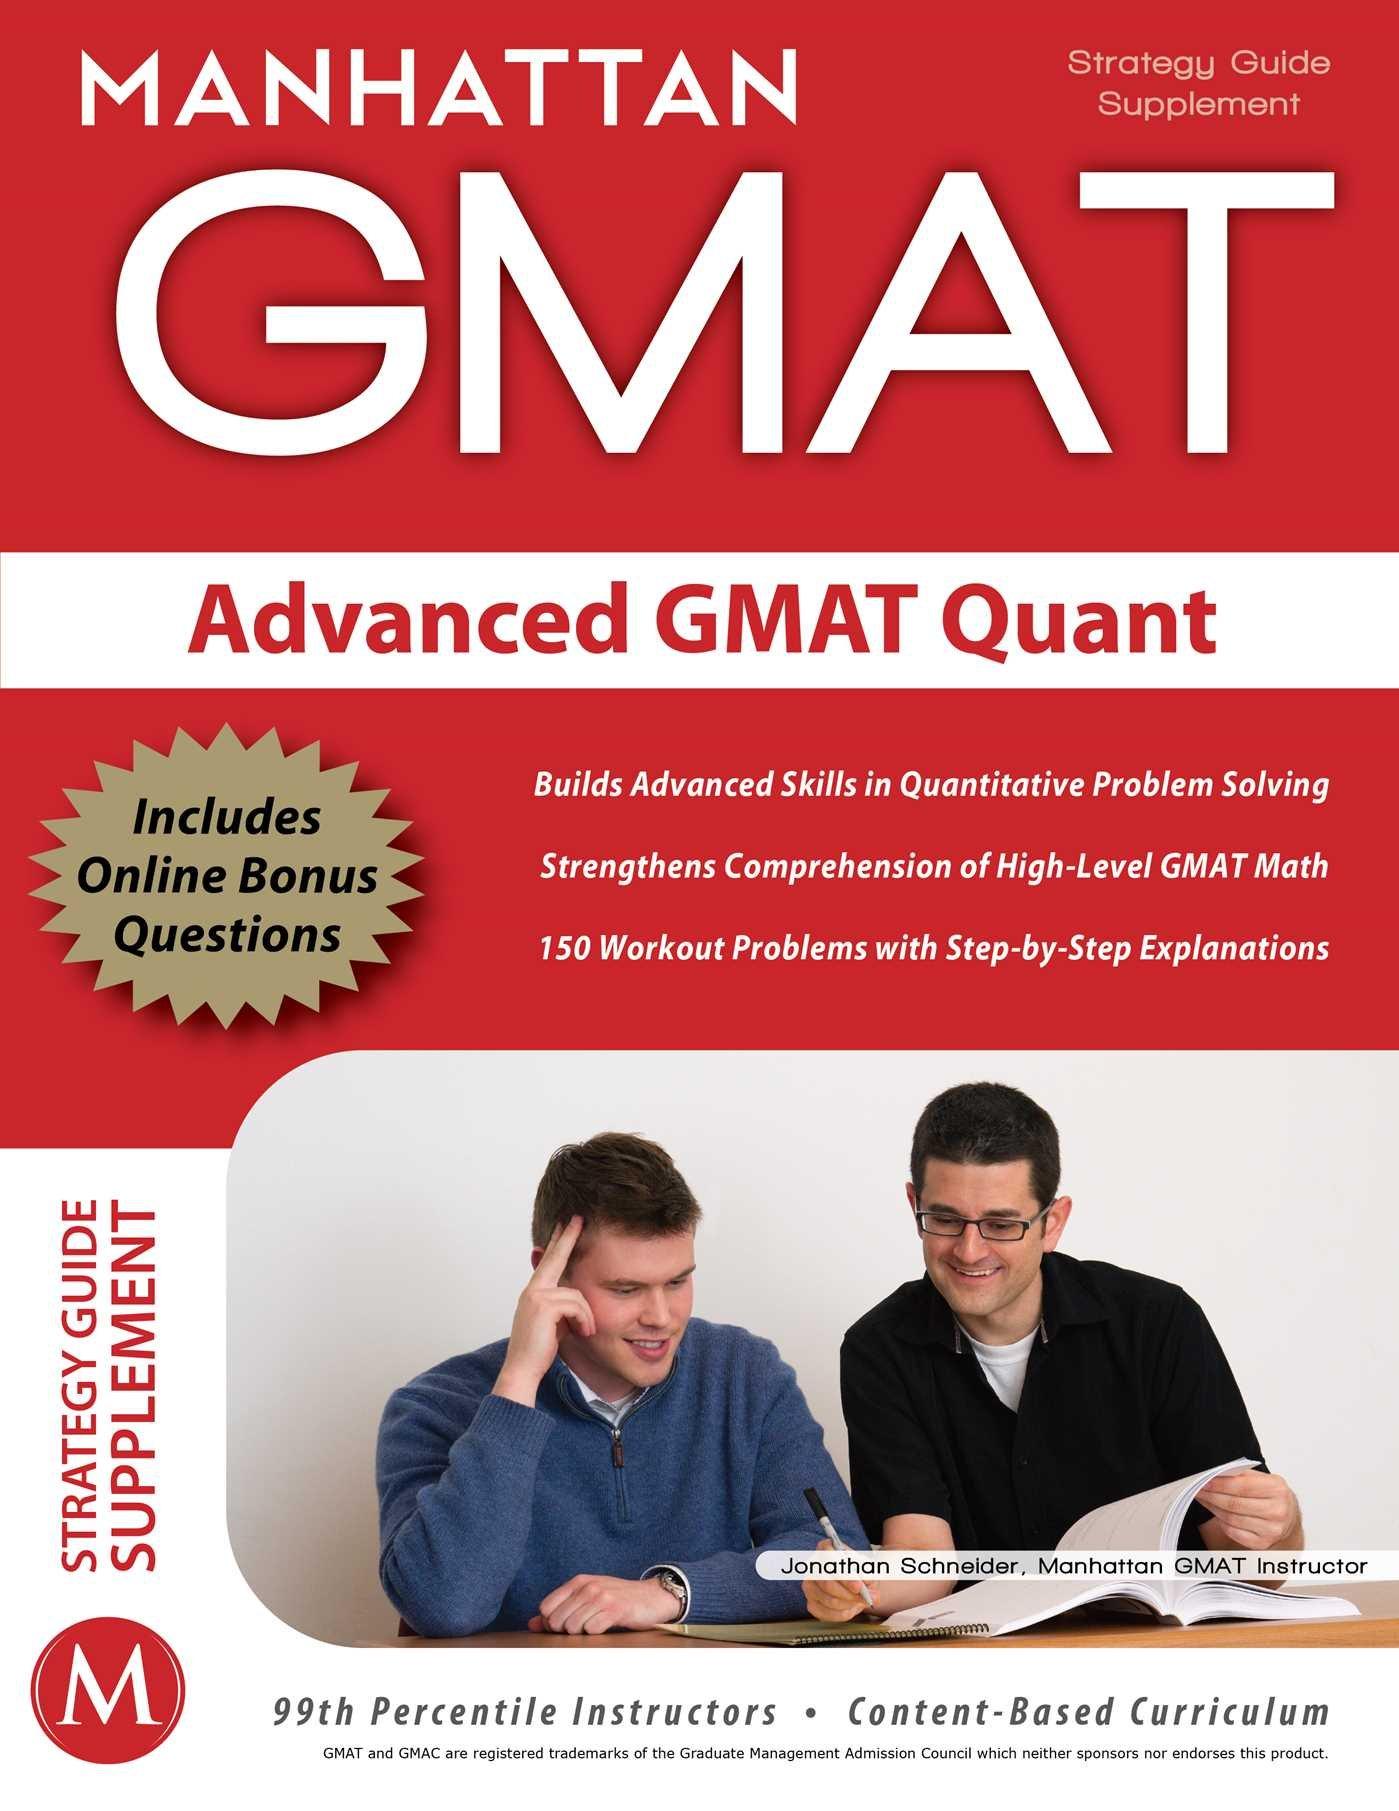 Advanced GMAT Quant (Gmat Strategy Guides): Amazon.co.uk: Manhattan Gmat:  9781935707158: Books